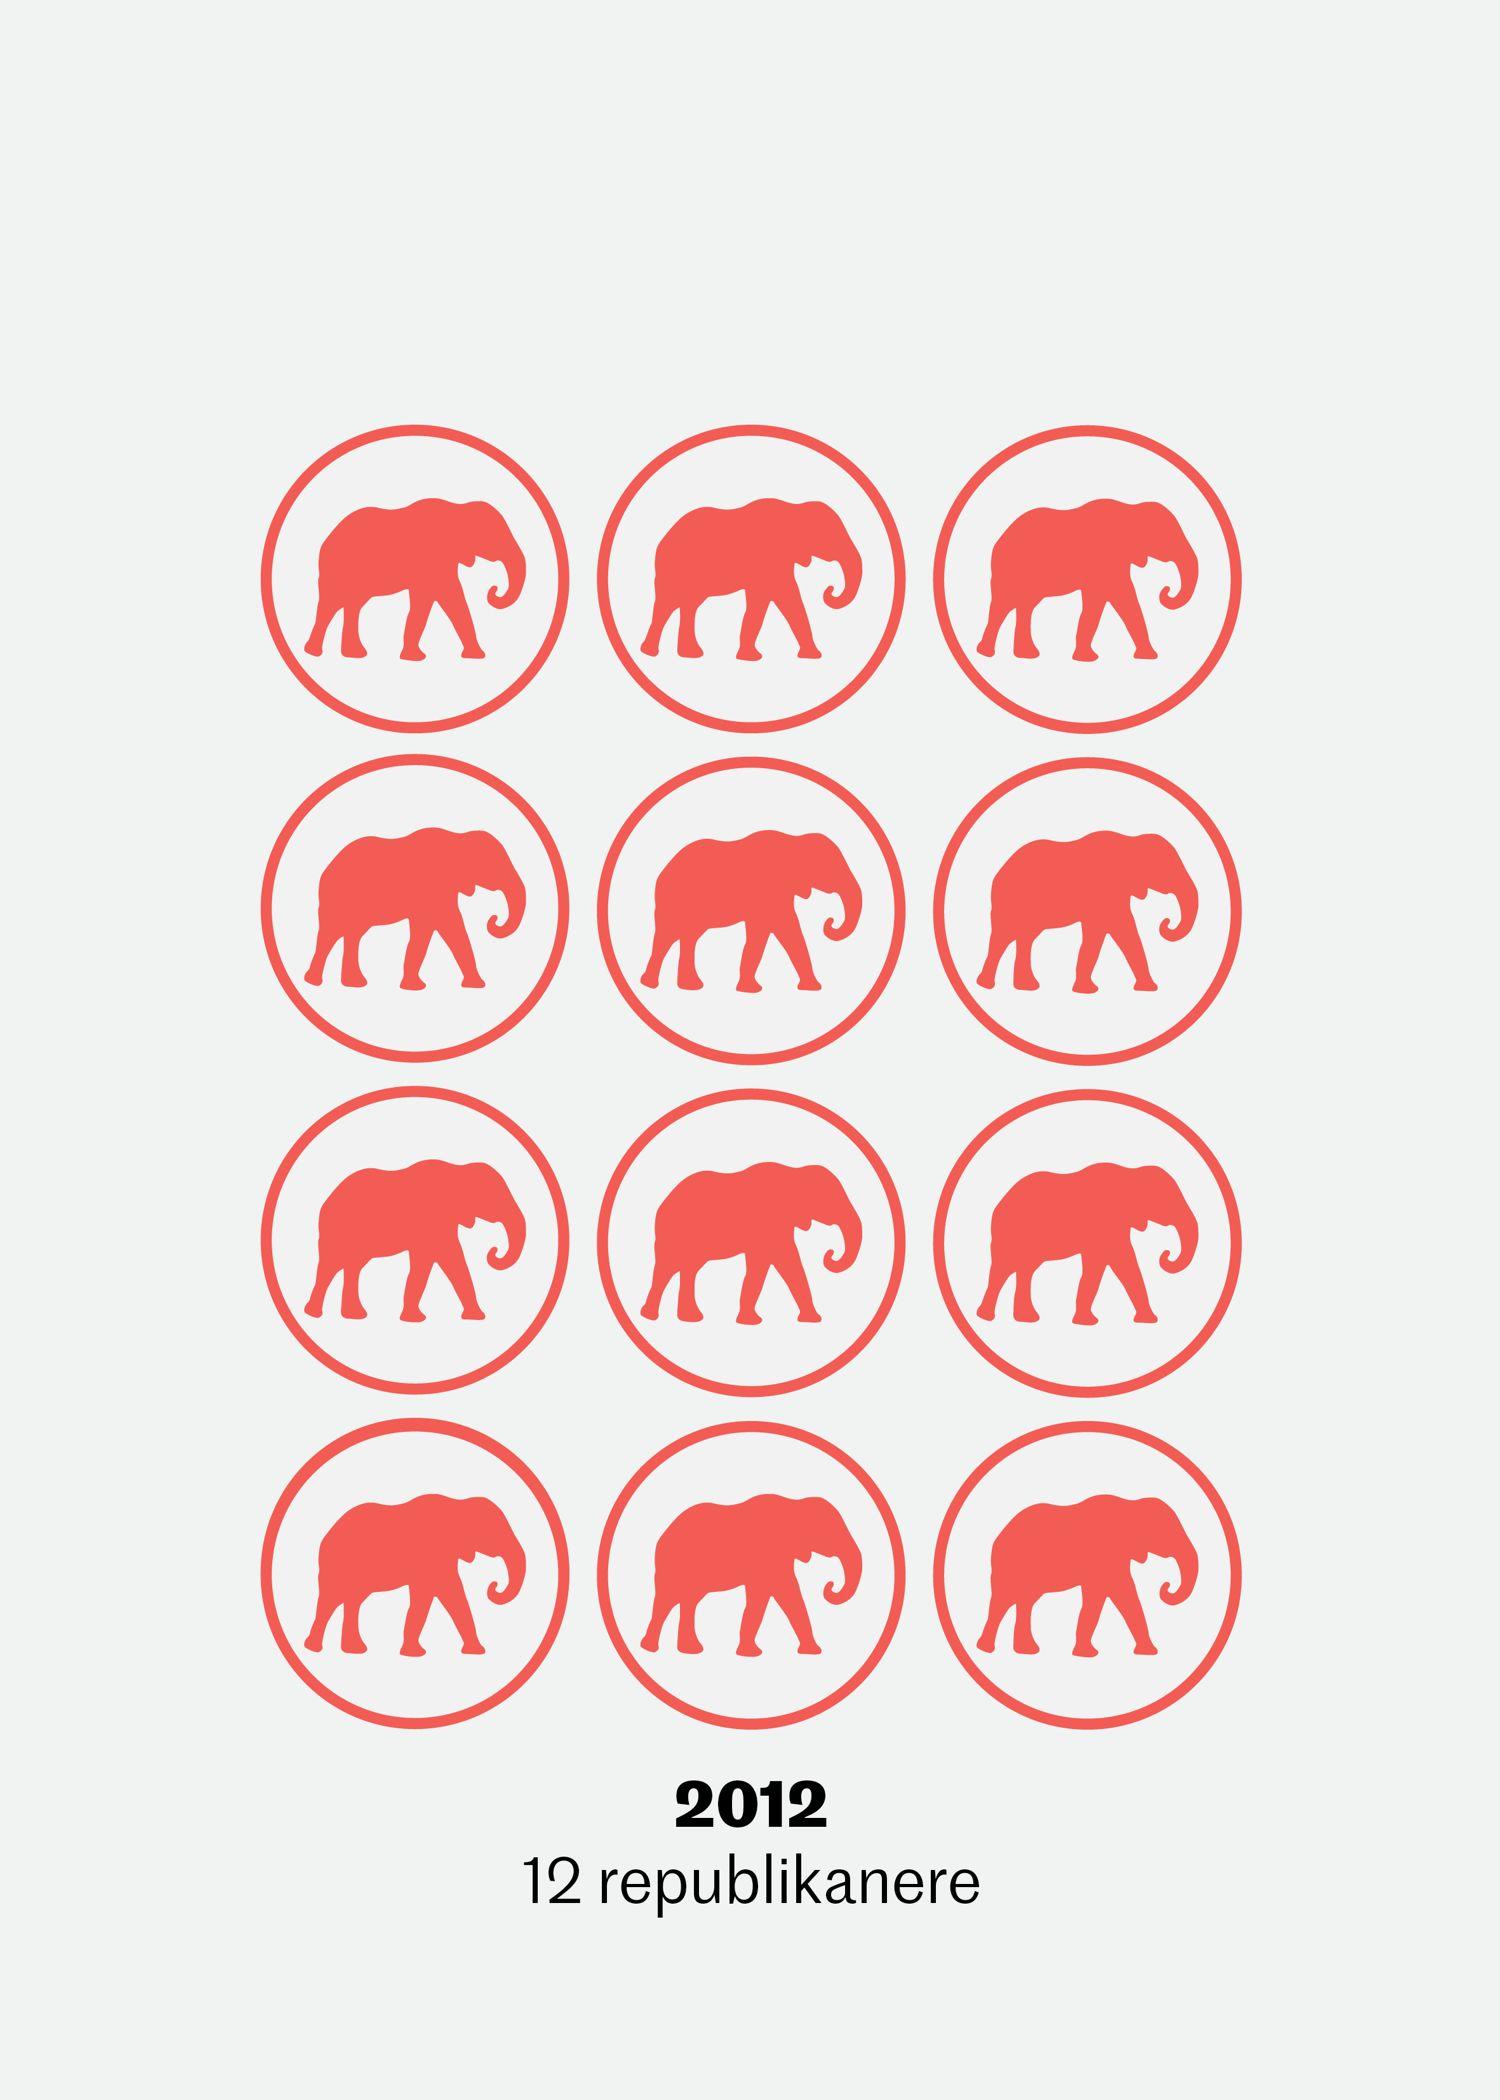 kandidater_2012_4.jpg